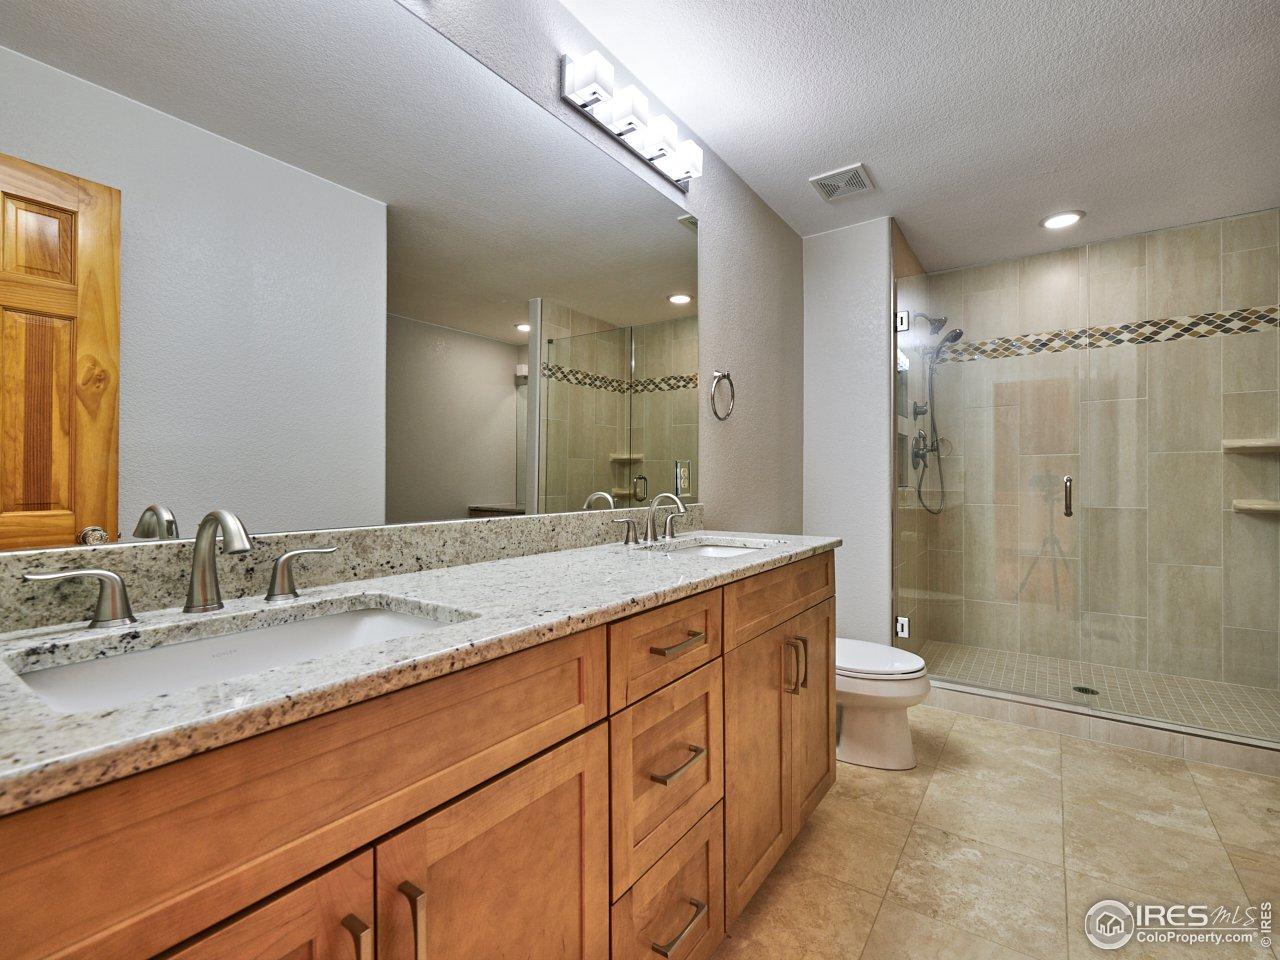 Brand new master bathroom